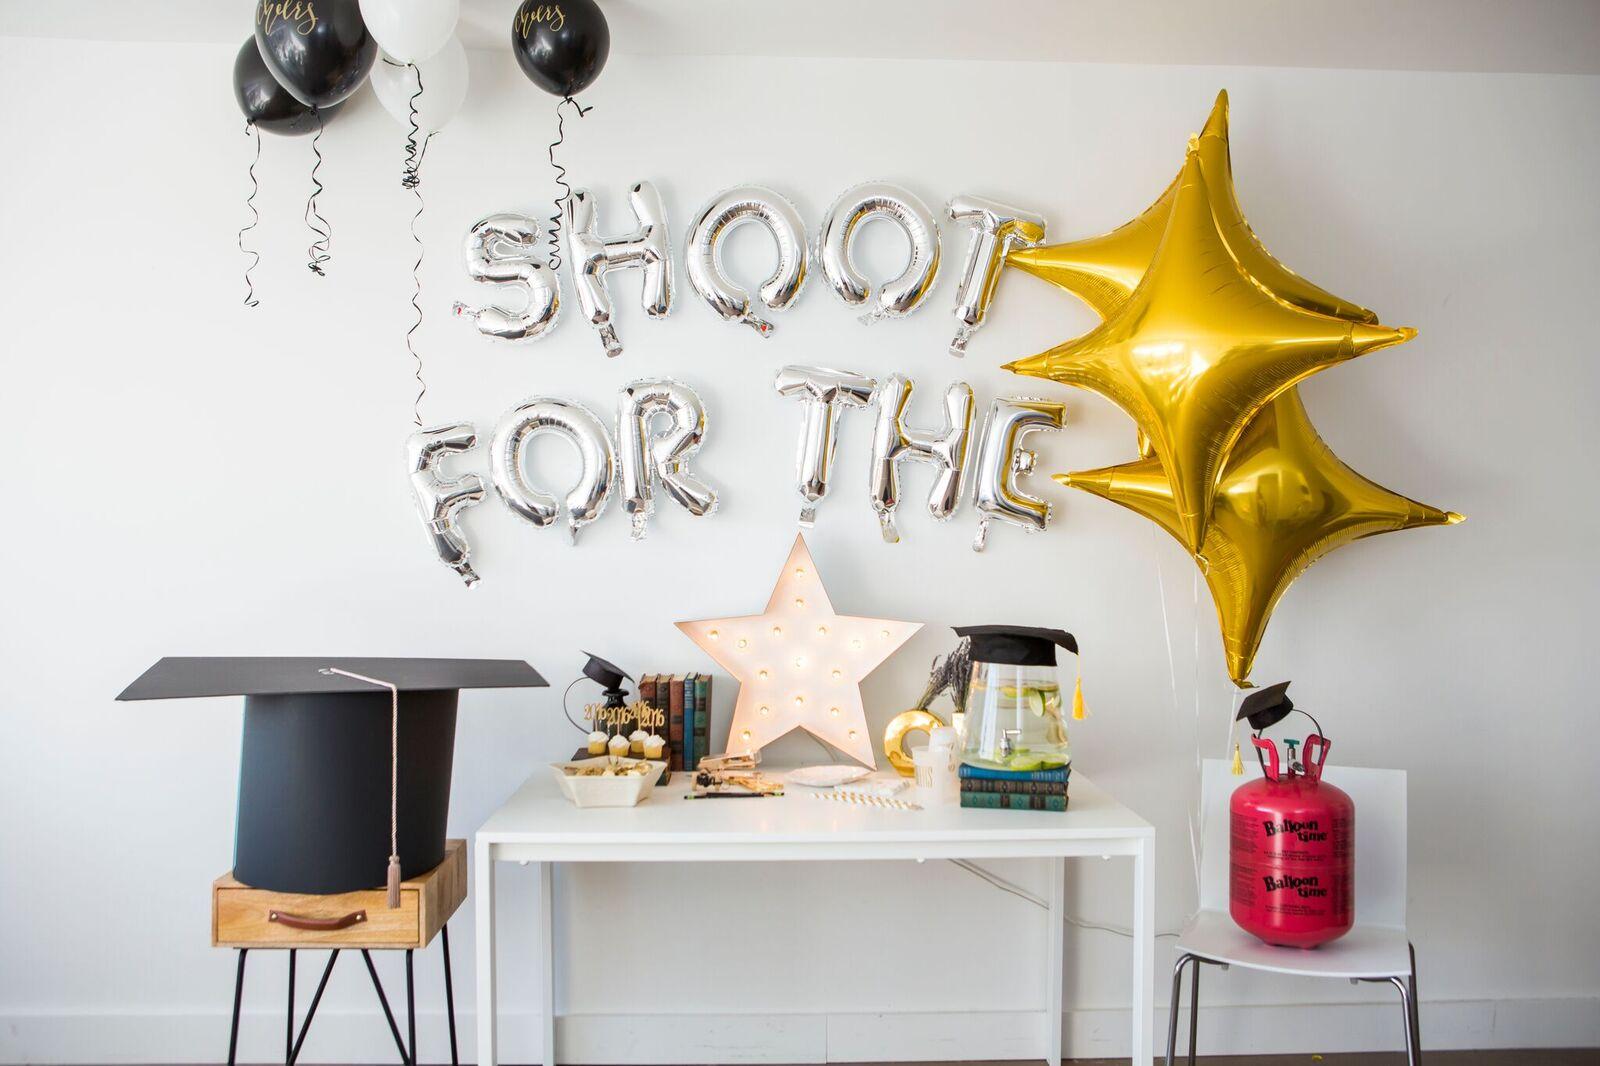 8 Of The Best Backyard Graduation Party Ideas